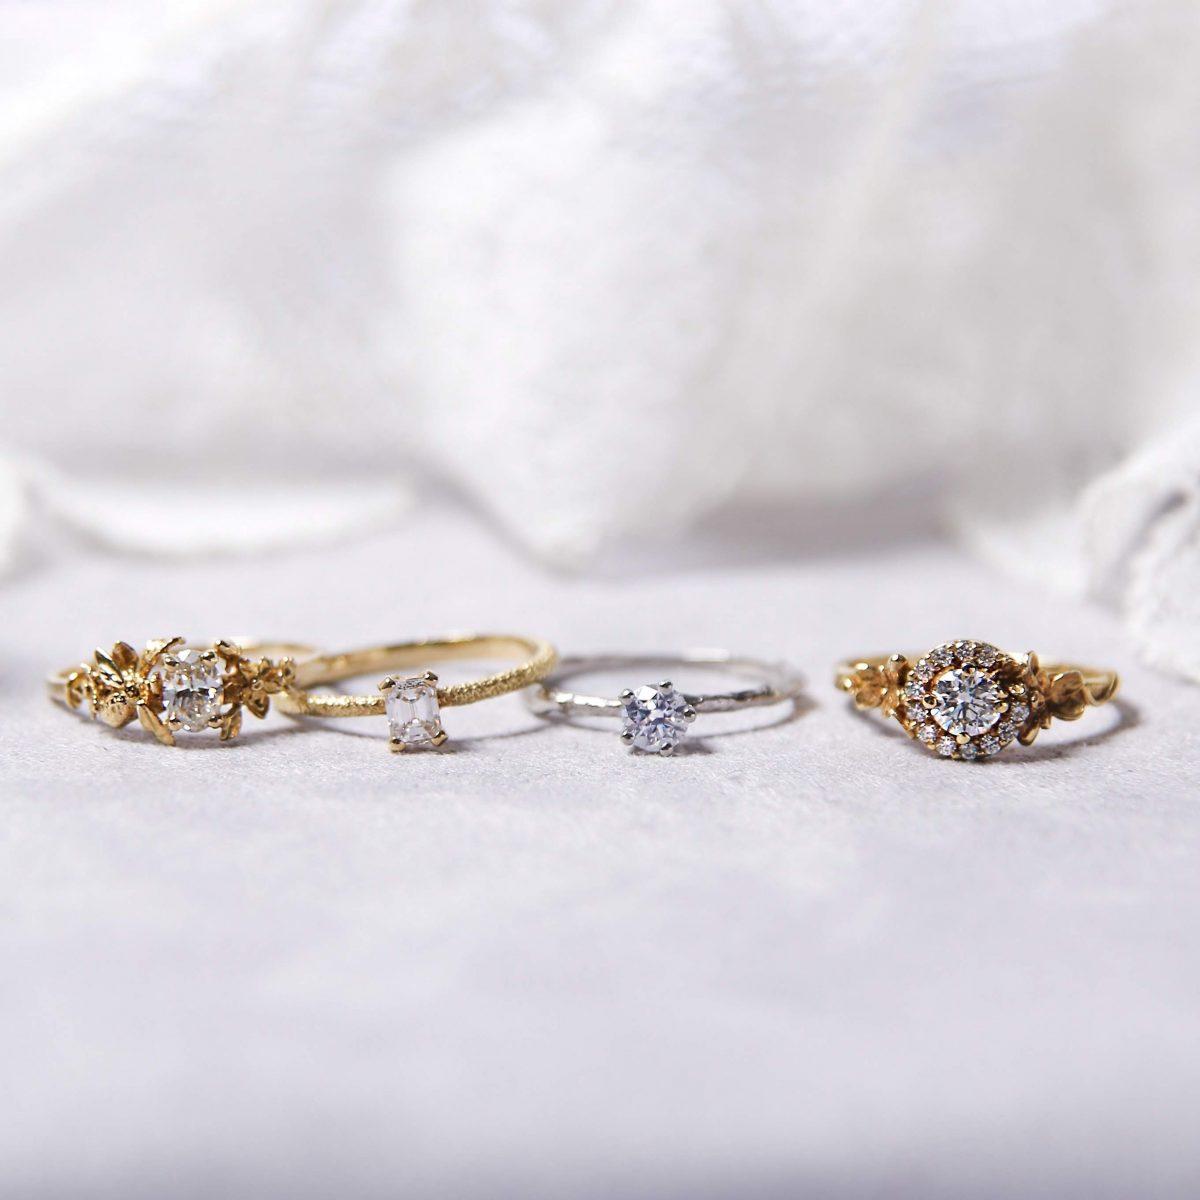 ALEX MONROE アレックスモンロー HPFRANCEBIJOUX HPFRANCE アッシュペー アッシュペービジュー アッシュペーフランスビジュー パートナーシップ ブライダル マリッジ エンゲージ 結婚指輪 婚約指輪